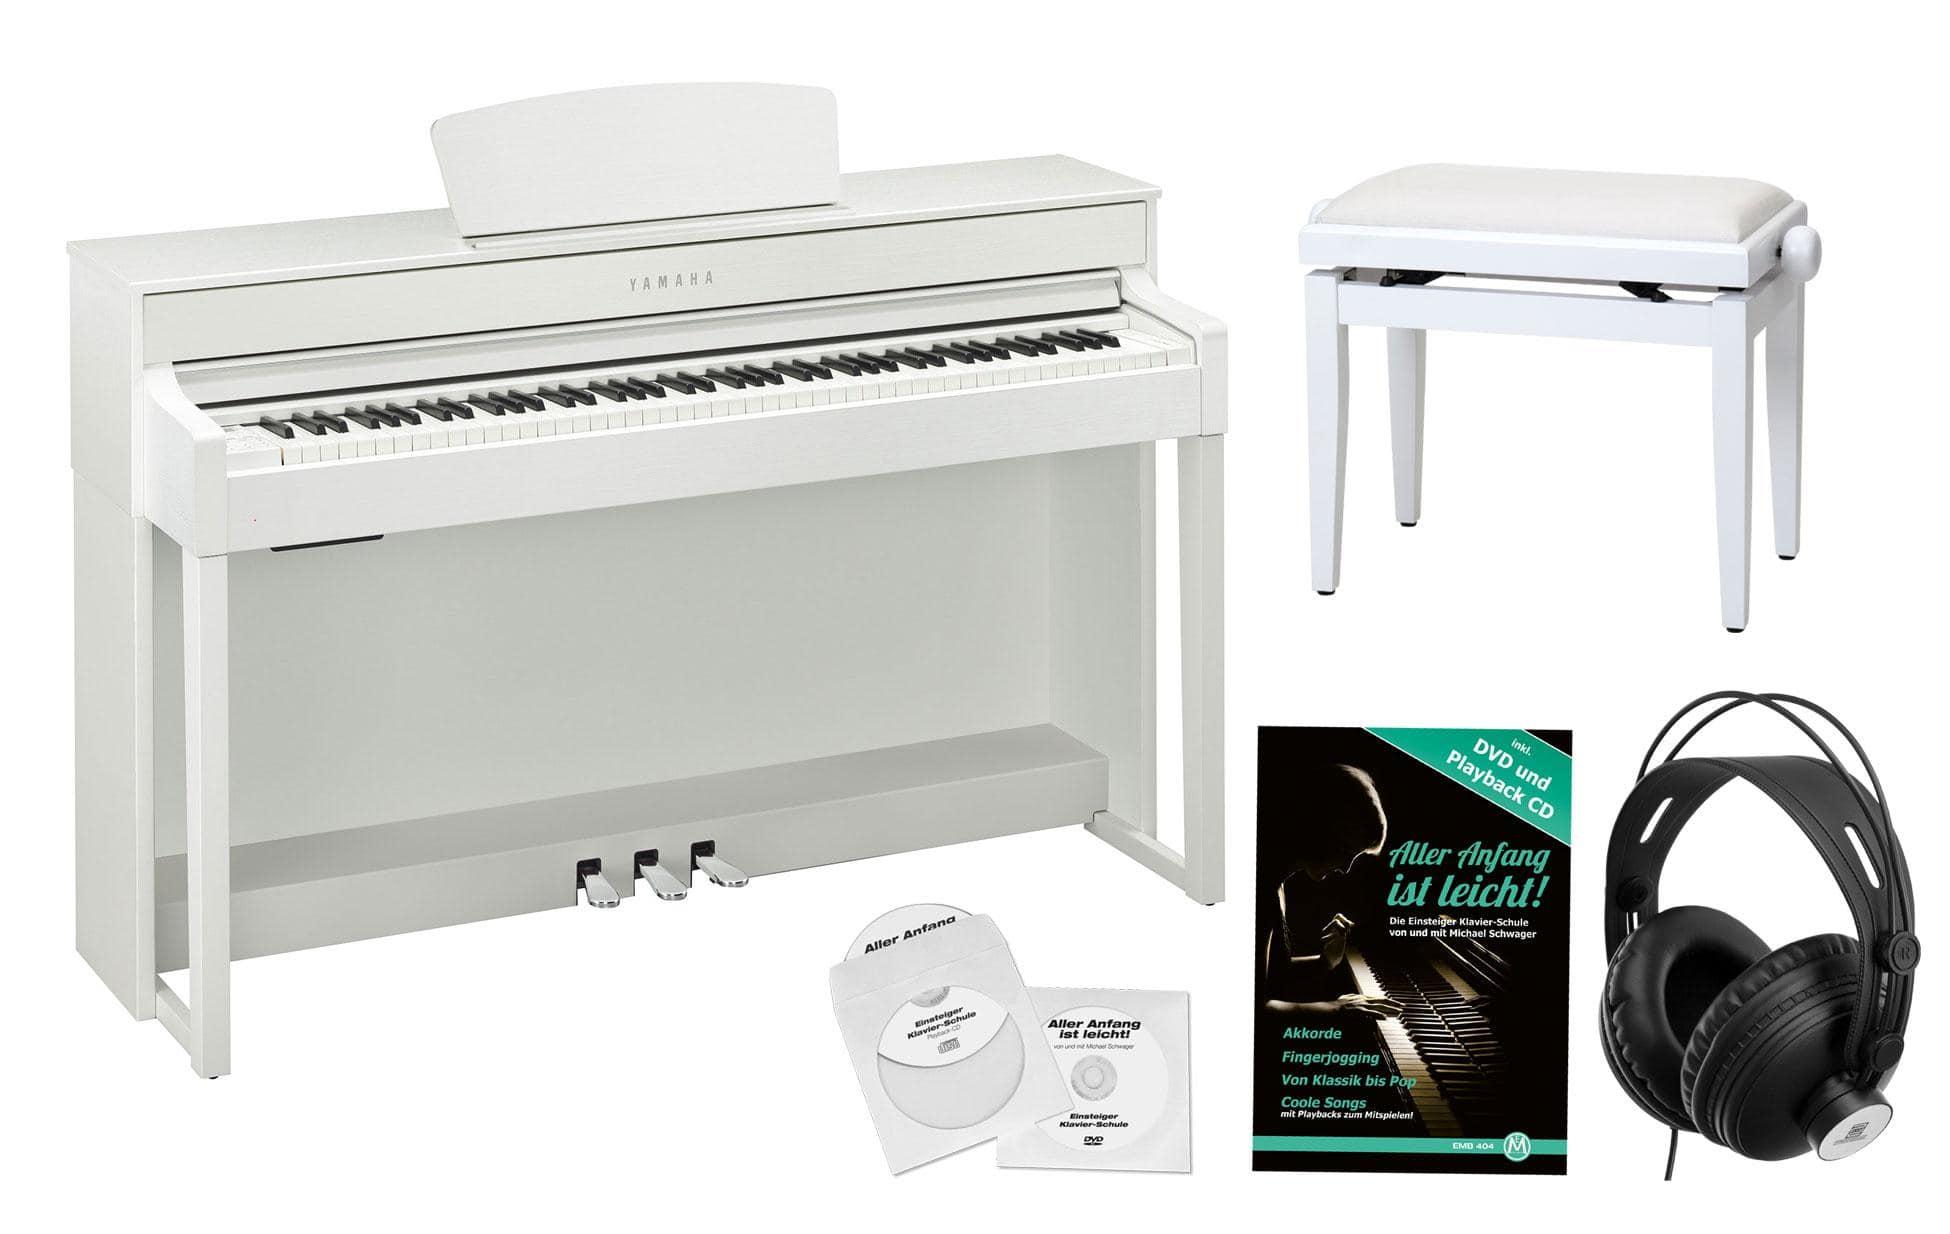 digitalpiano gebraucht preisvergleiche. Black Bedroom Furniture Sets. Home Design Ideas